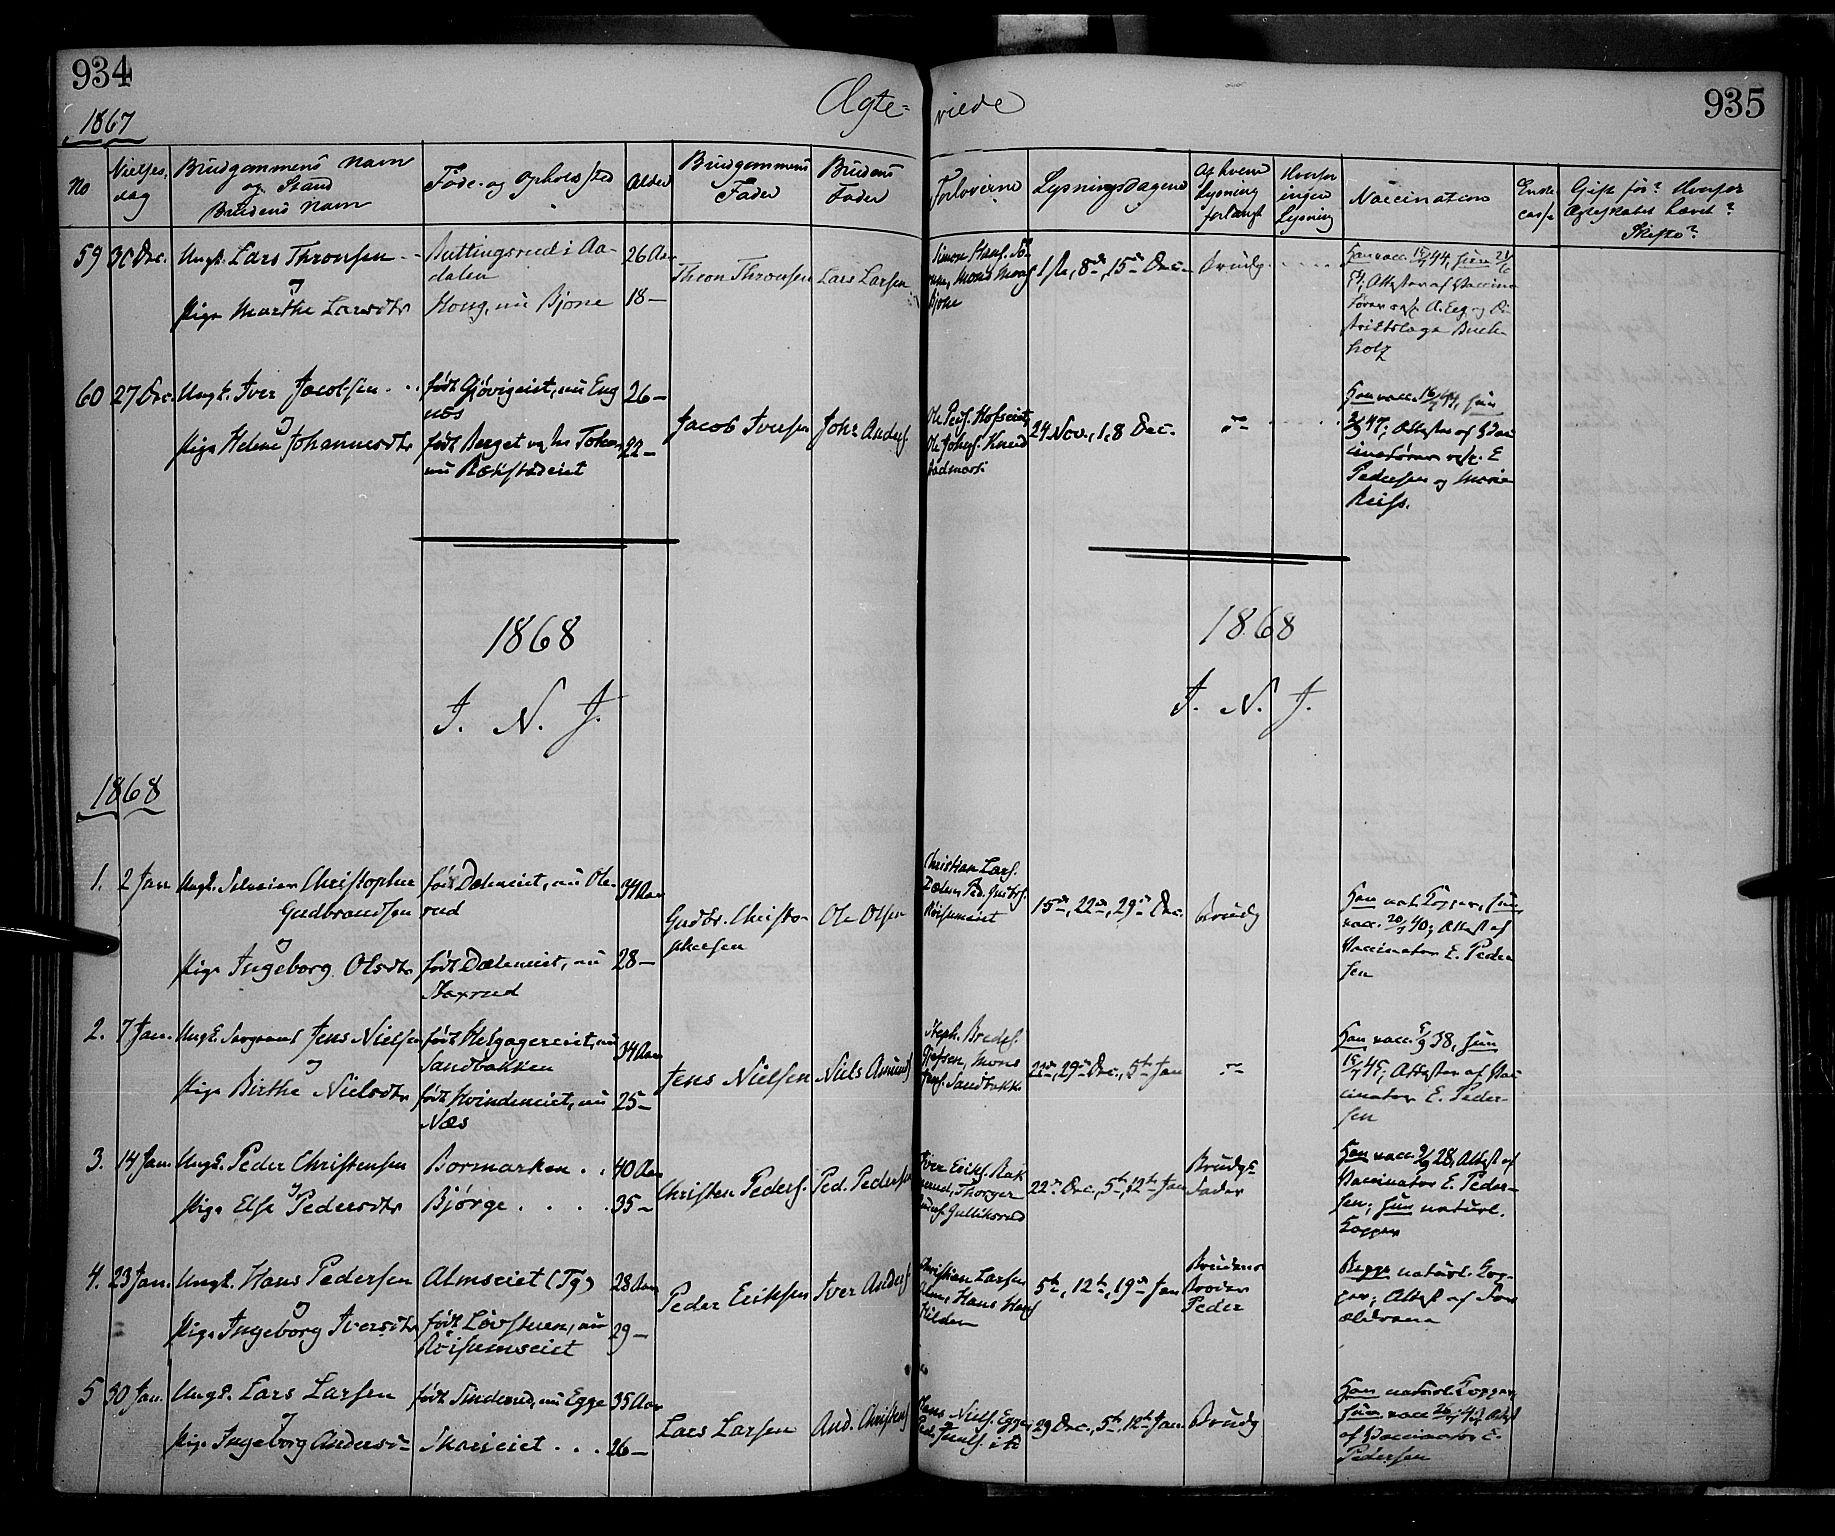 SAH, Gran prestekontor, Ministerialbok nr. 12, 1856-1874, s. 934-935